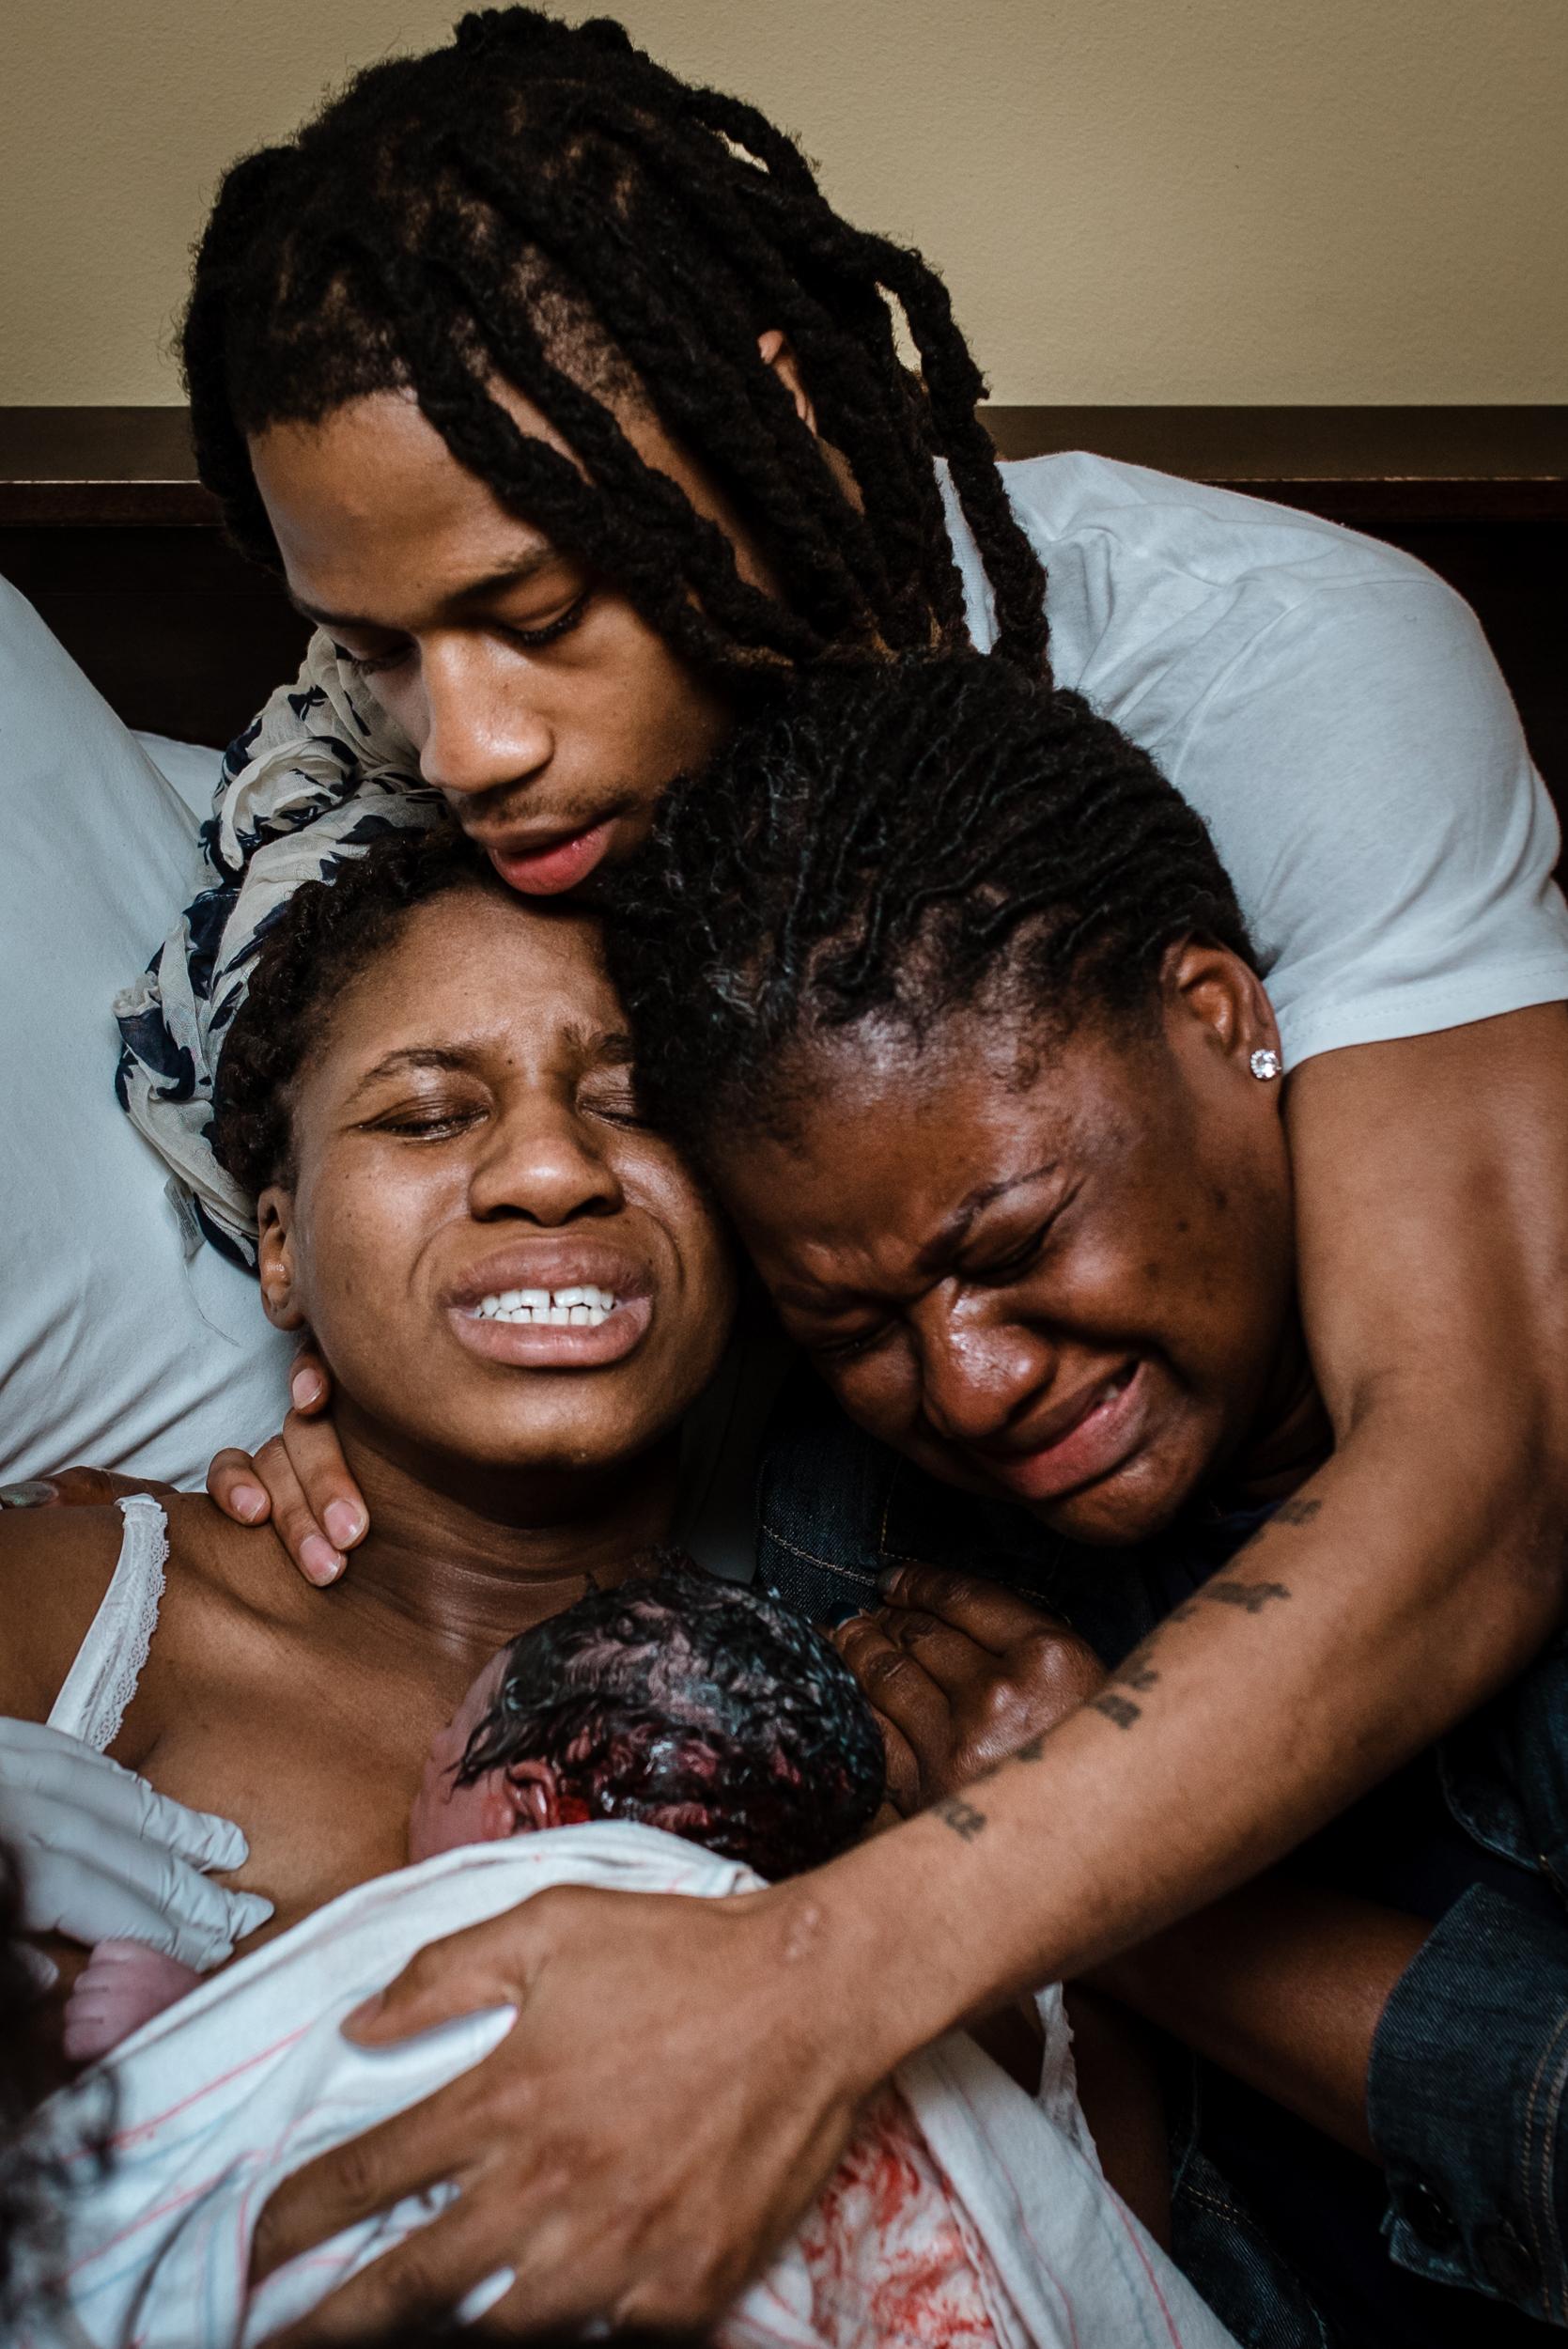 Best Birth Photography Minneapolis St. Paul Minnesota Meredith Westin-June 11, 2018-195816.jpg